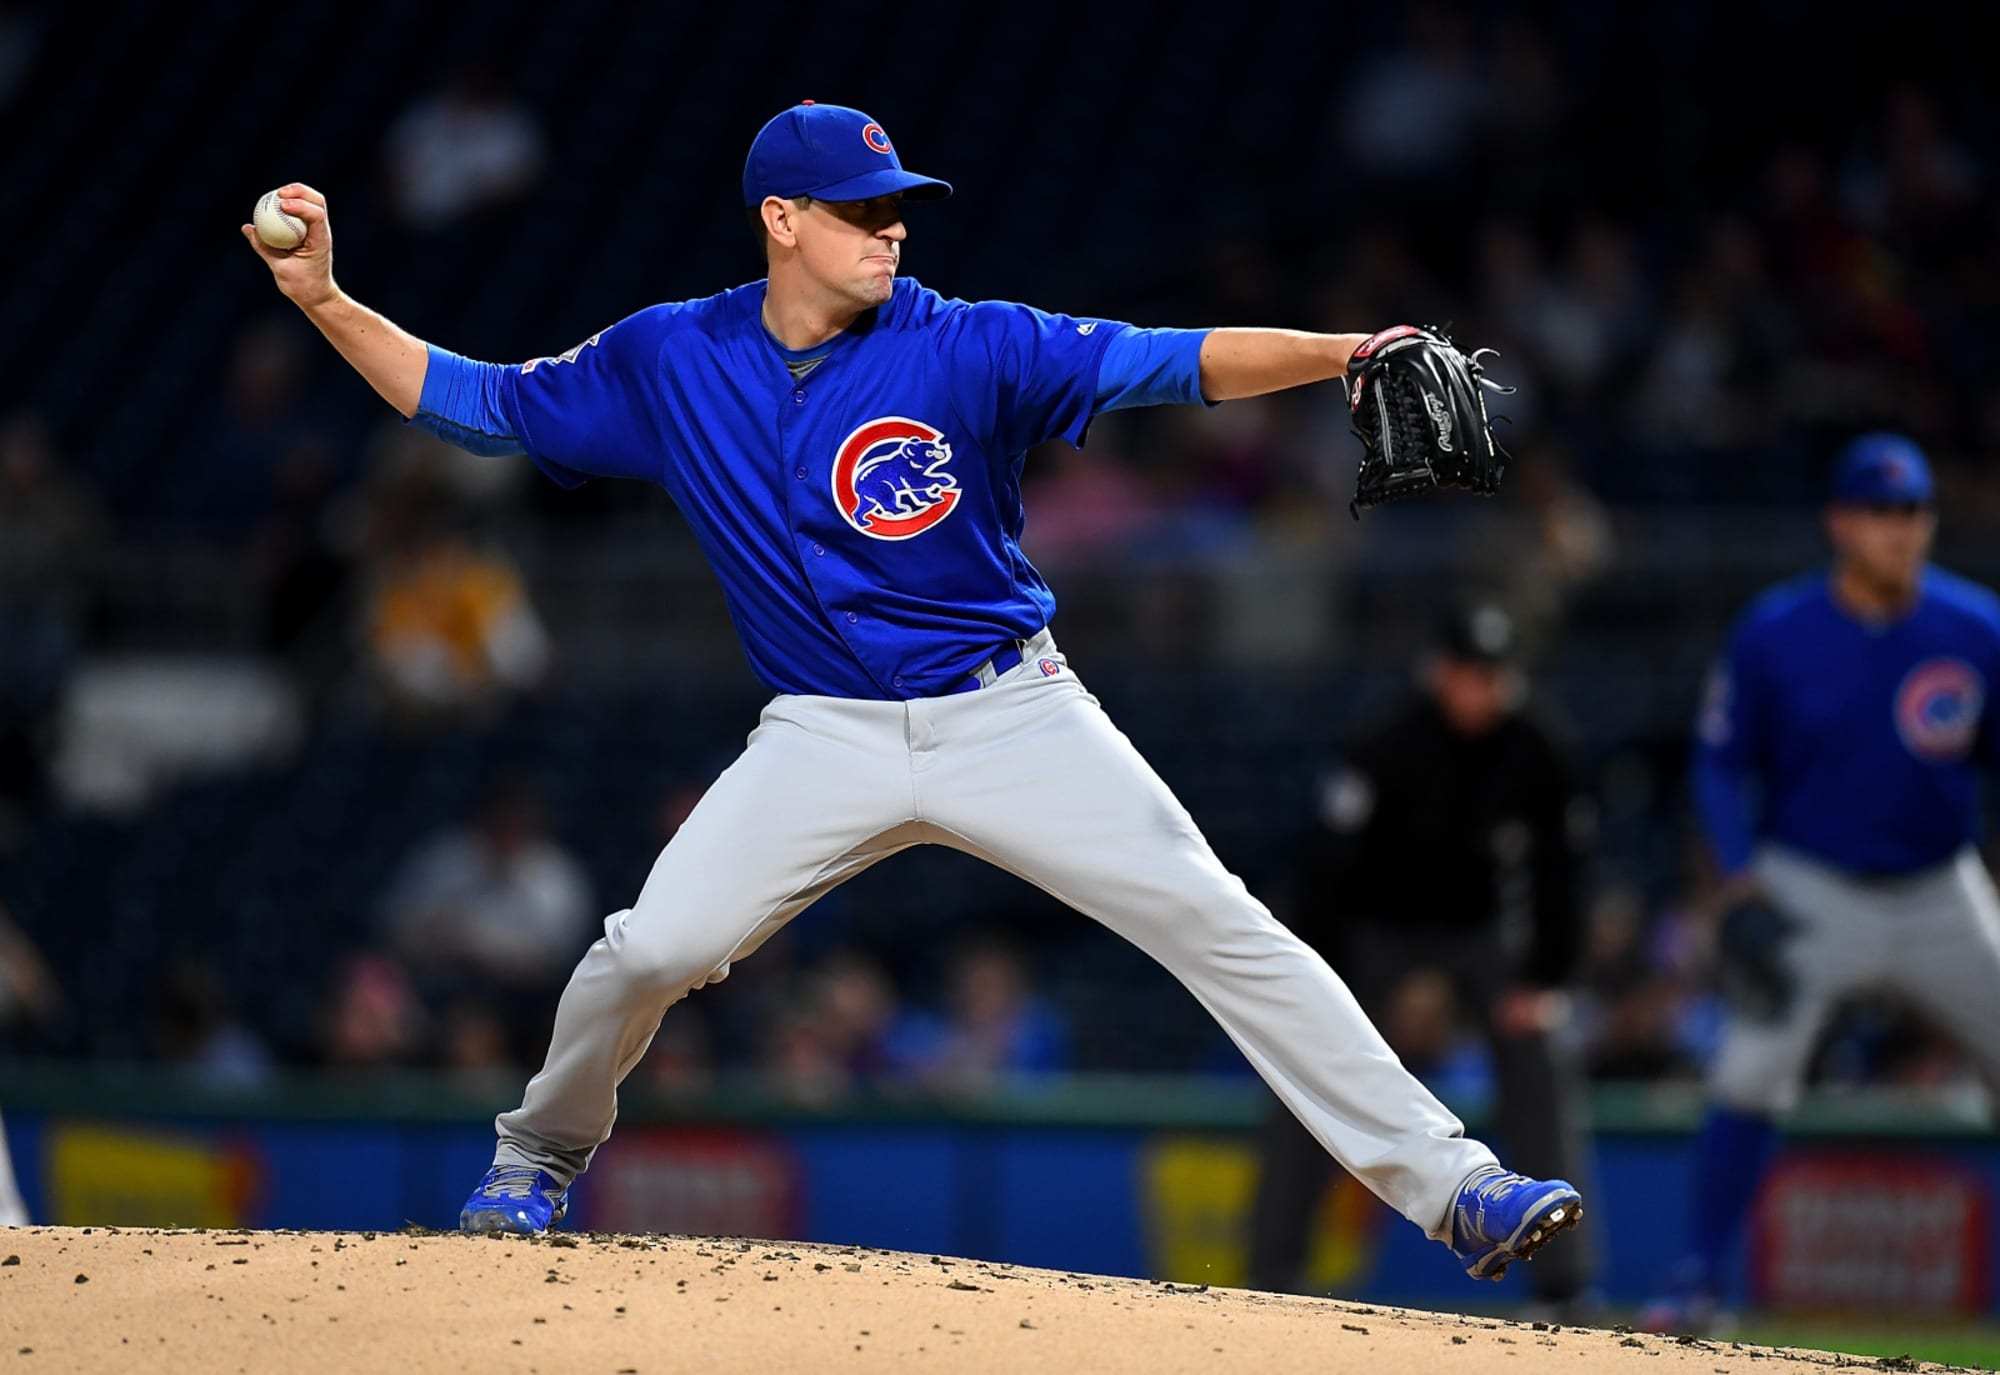 Chicago Cubs: Kyle Hendricks is a modern-day Greg Maddux